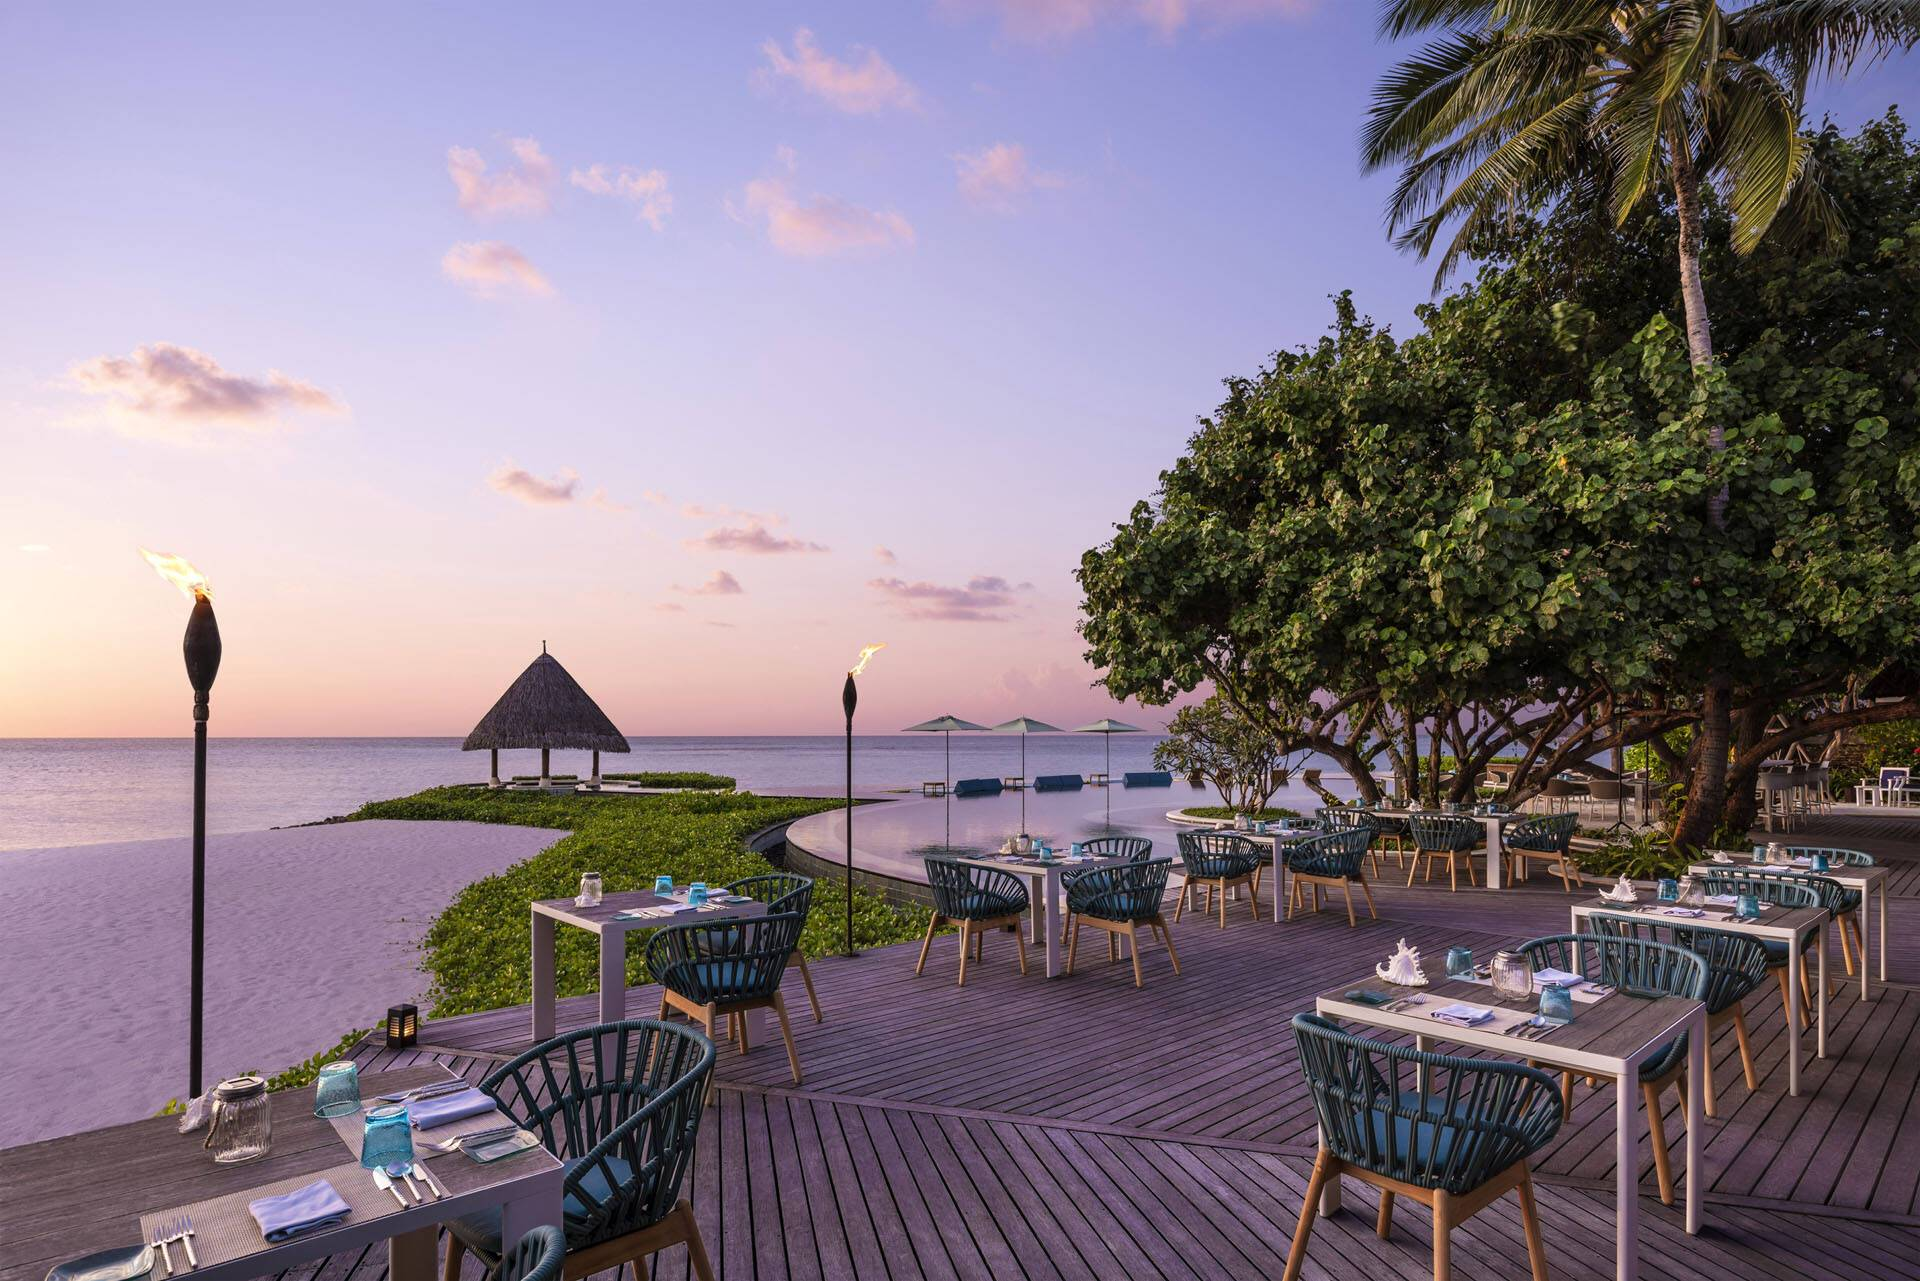 Four Seasons Kuda Huraa Maldives Restaurant